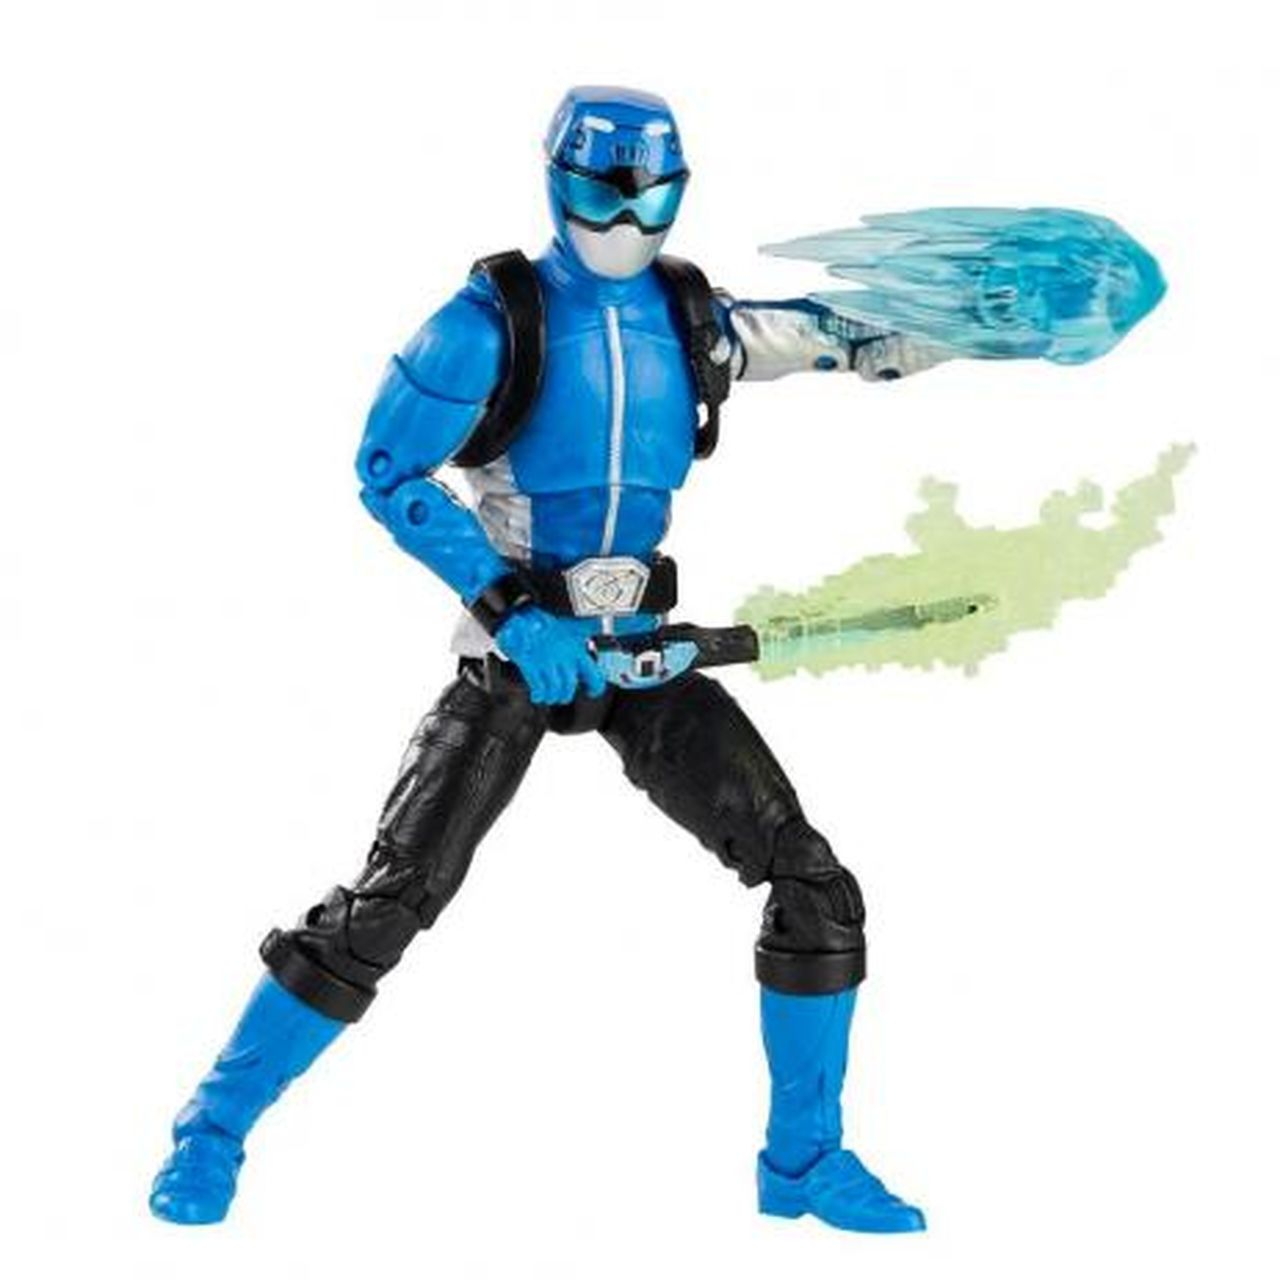 Action Figure Ranger Azul (Beast Morphers Blue Ranger): Power Rangers (Lightning Collection) - Hasbro